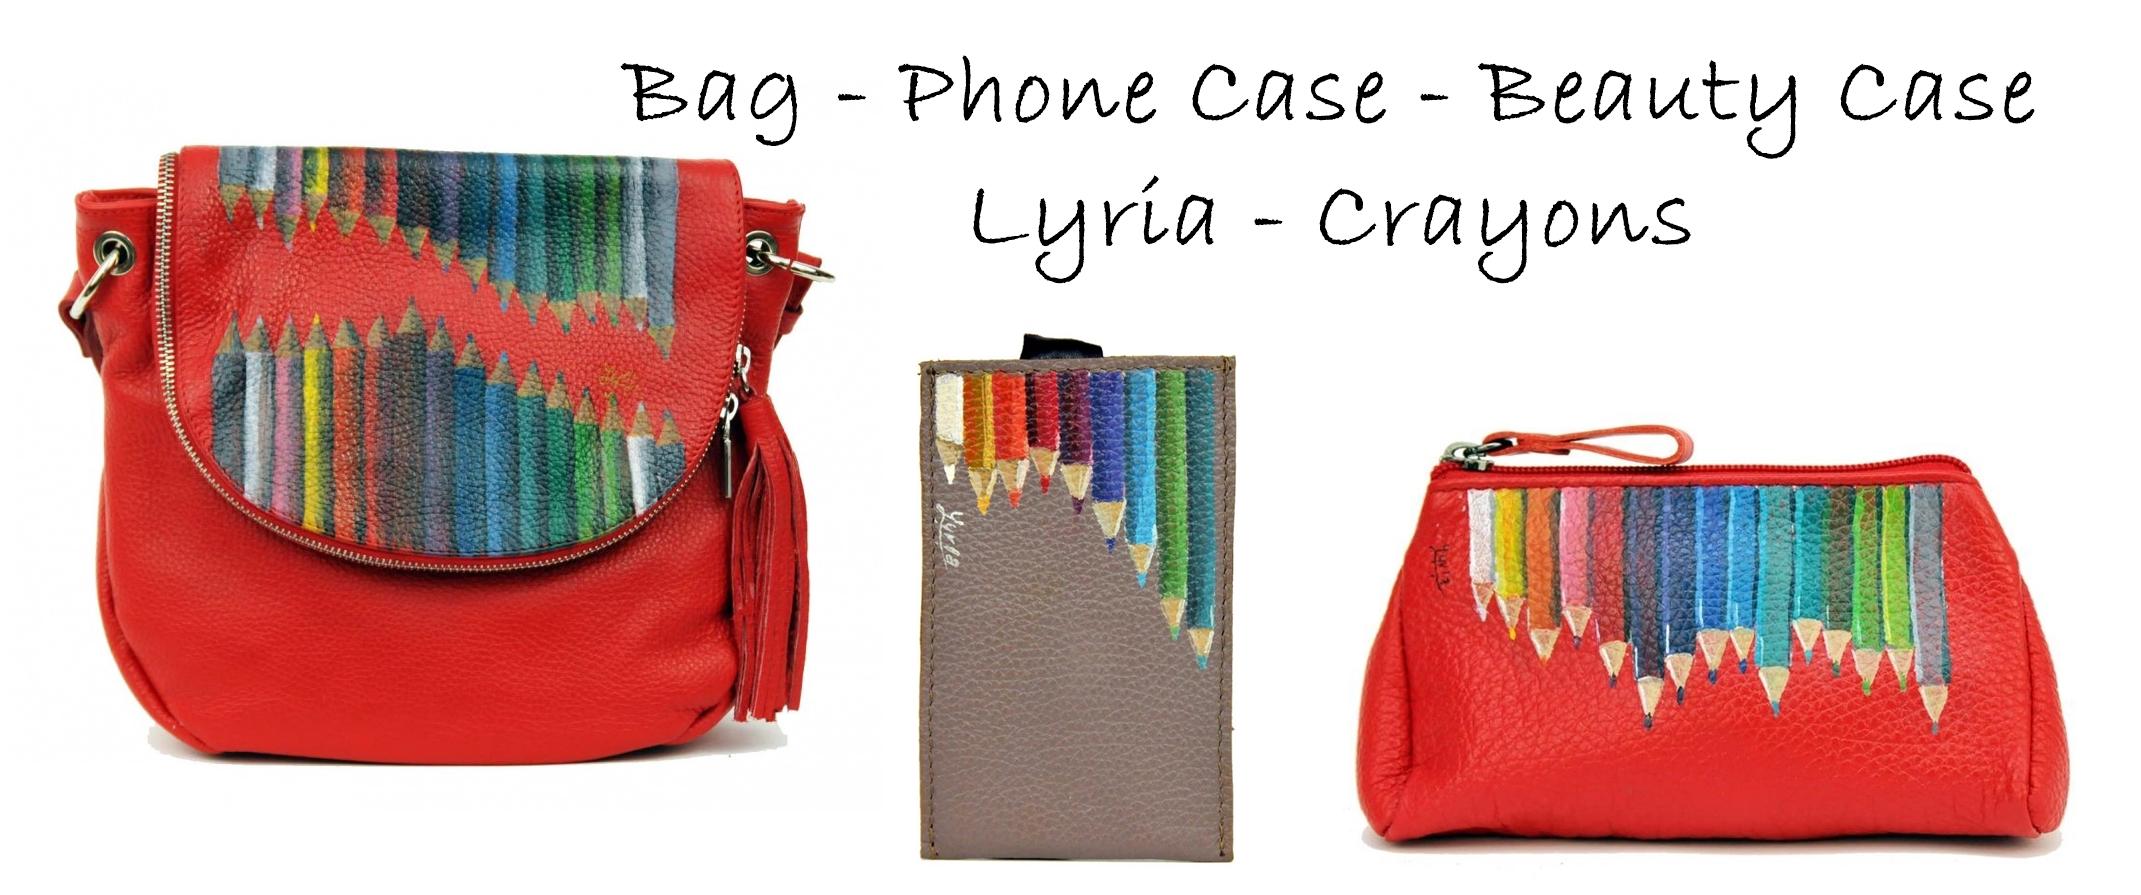 lyria crayons